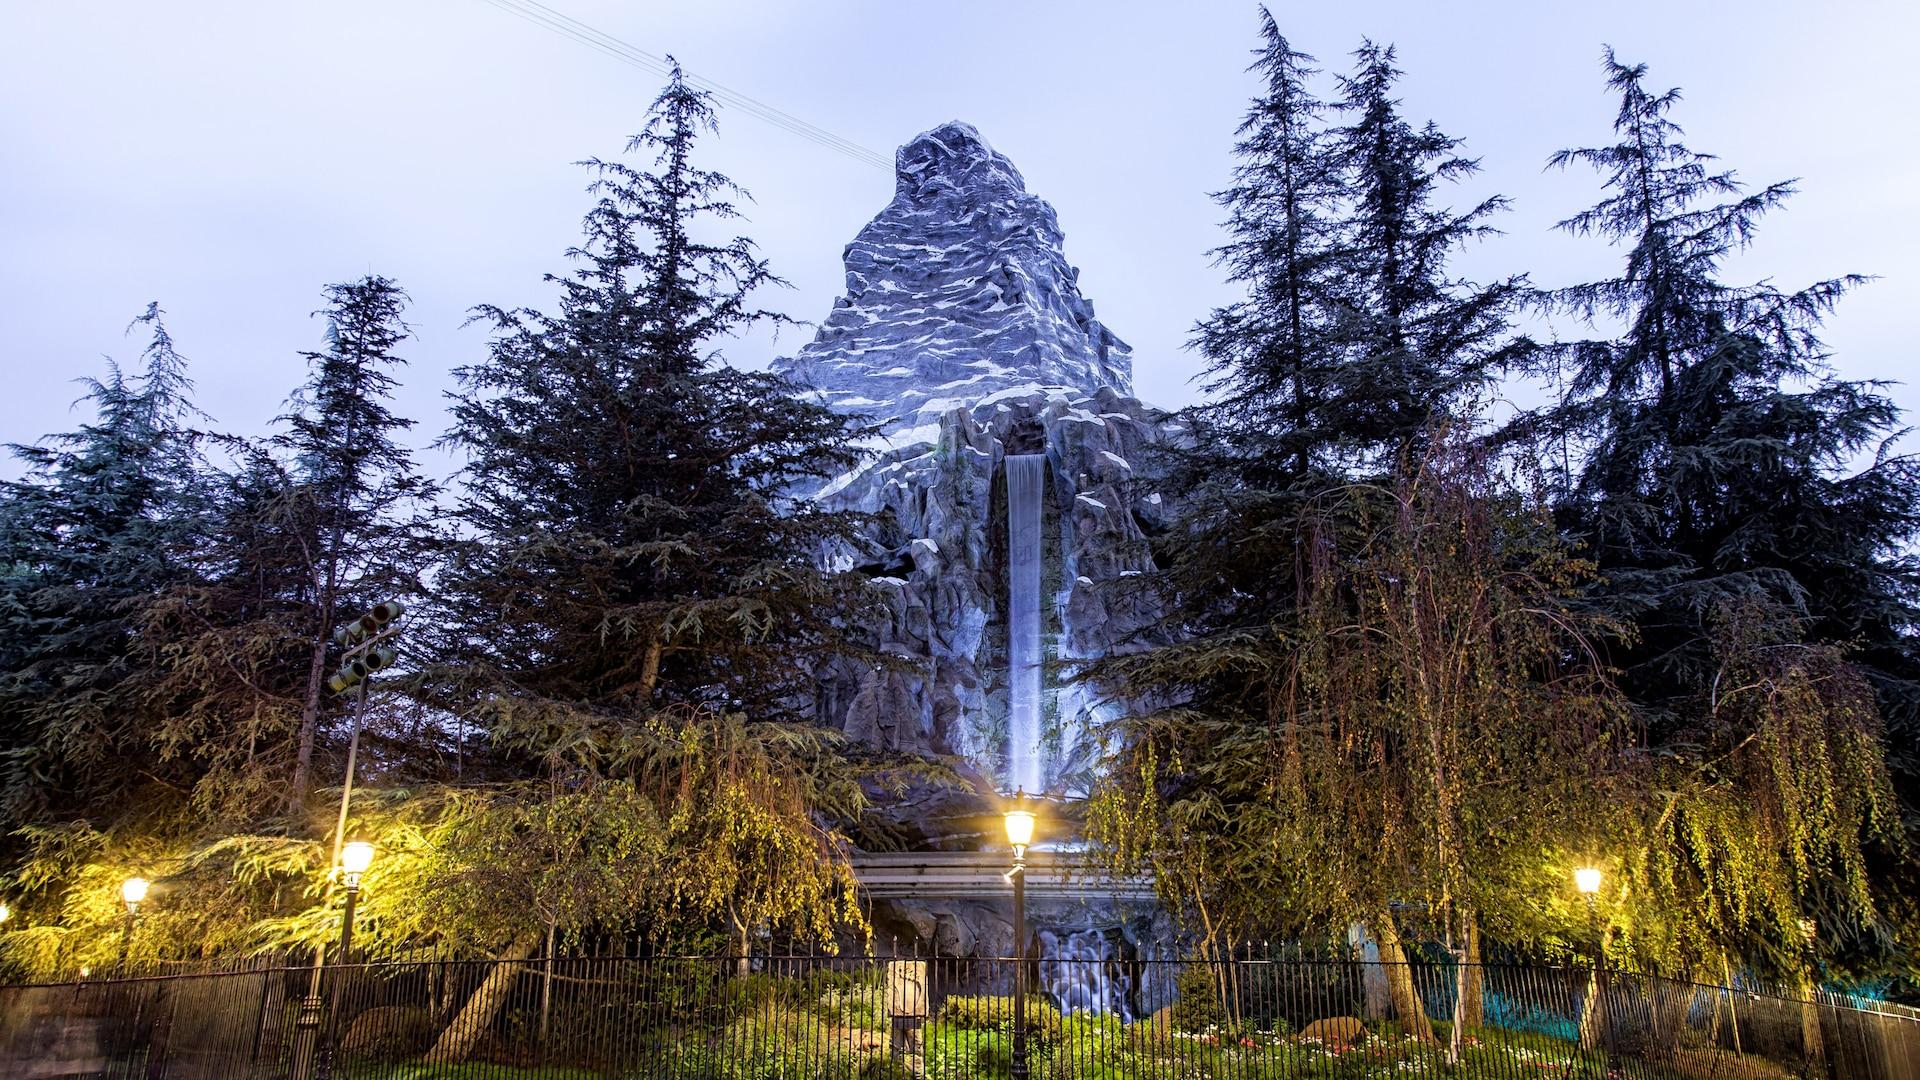 Matterhorn Bobsleds Rides Attractions Disneyland Park